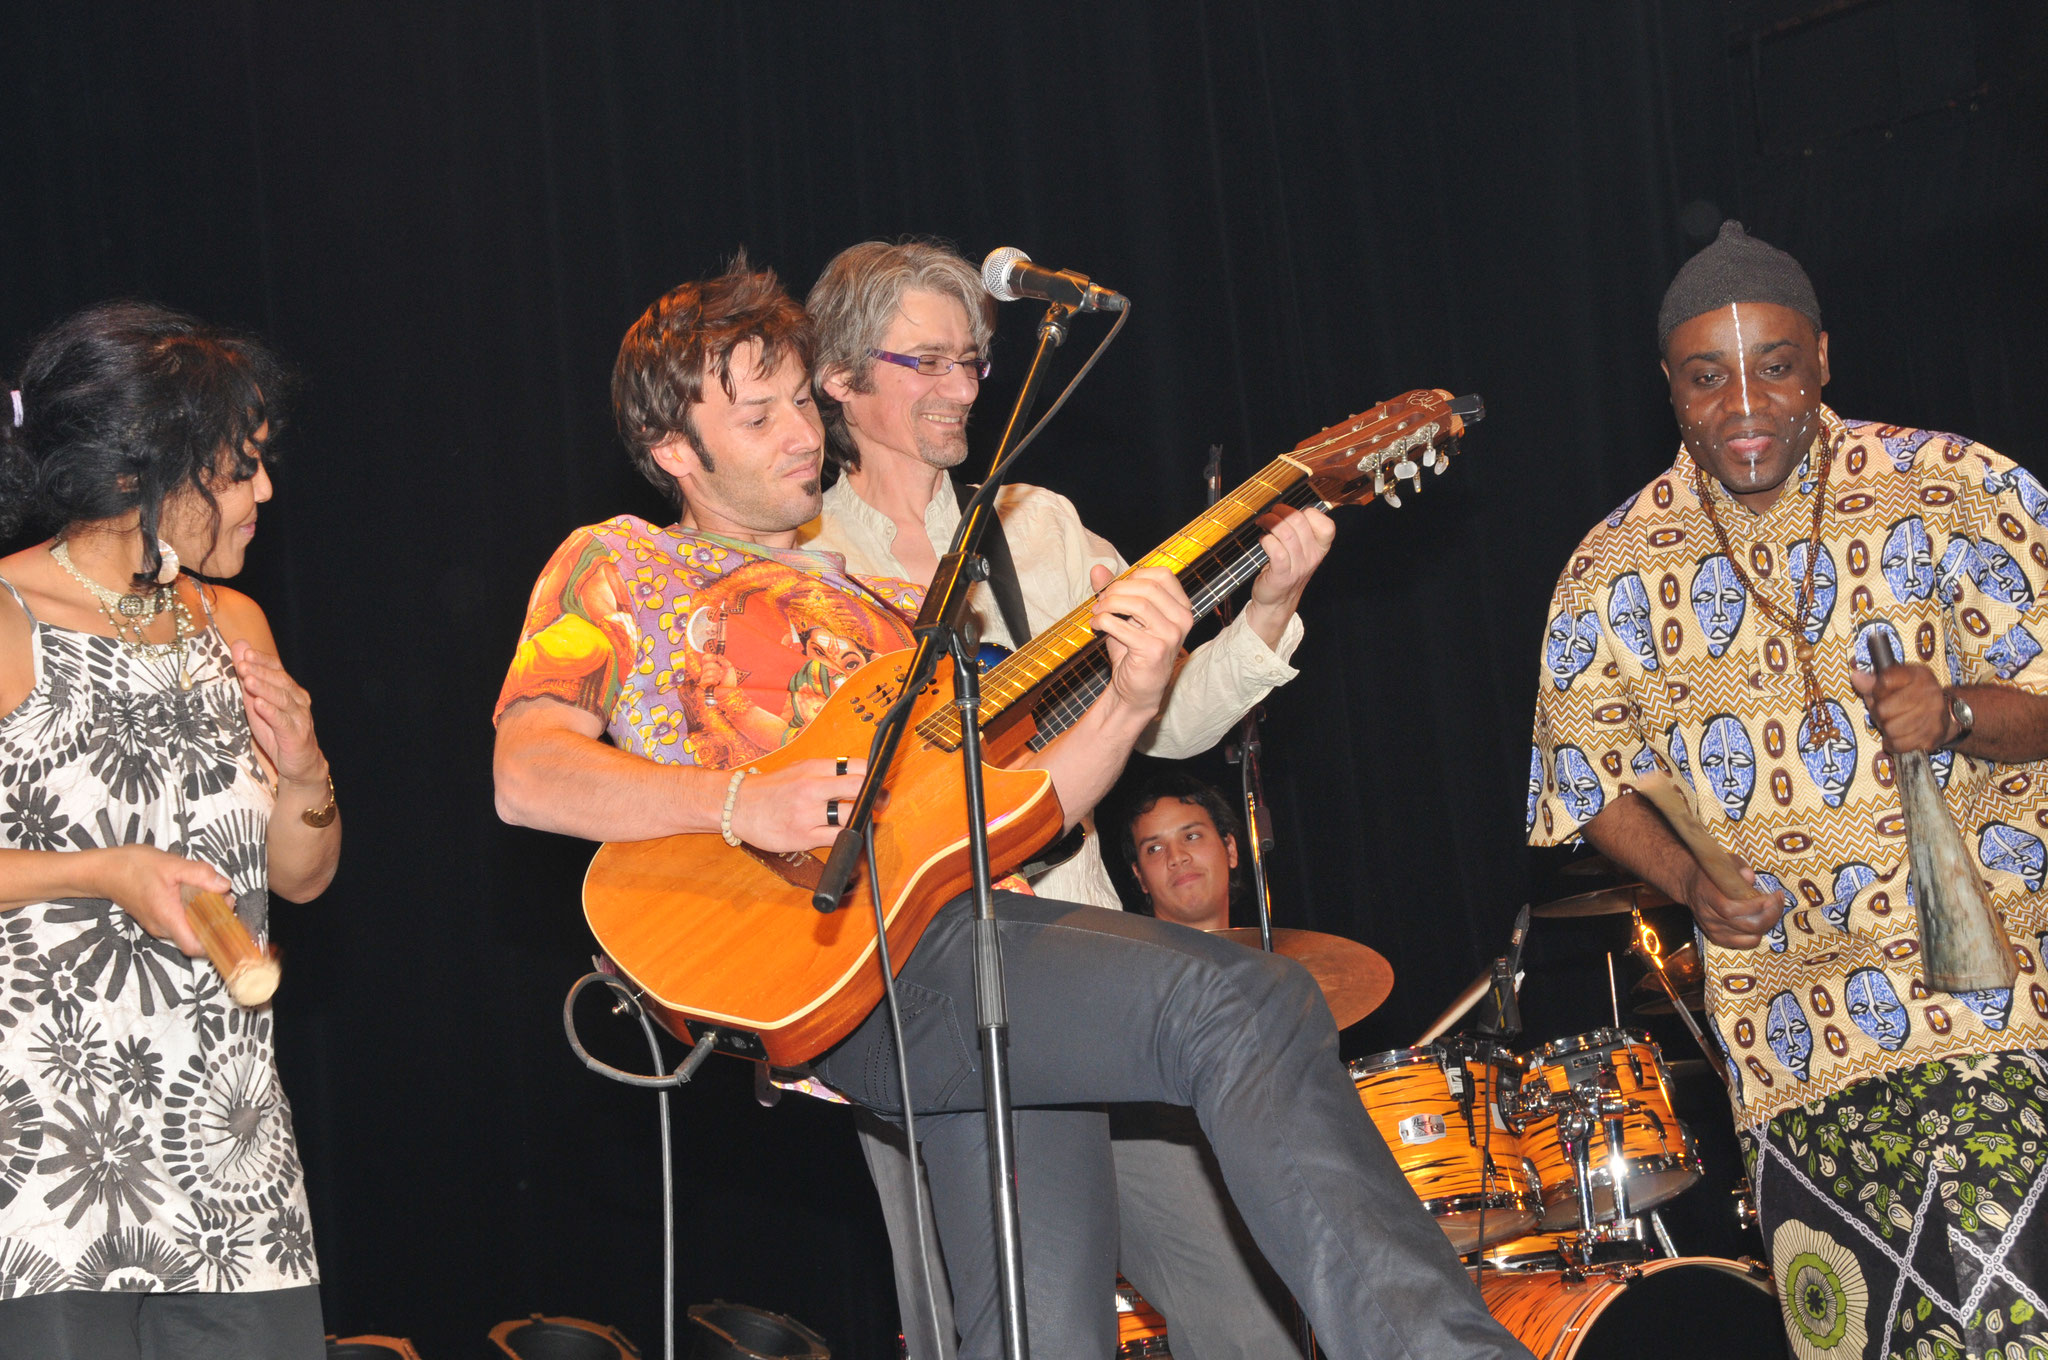 Les Jumeaux de MASAO (Masao Masu) with guitarist arranger Phil Robert, Olivier Freche, Sha Rakotofiringa and Davy Honnet. Photo : Jean-Luc Karcher